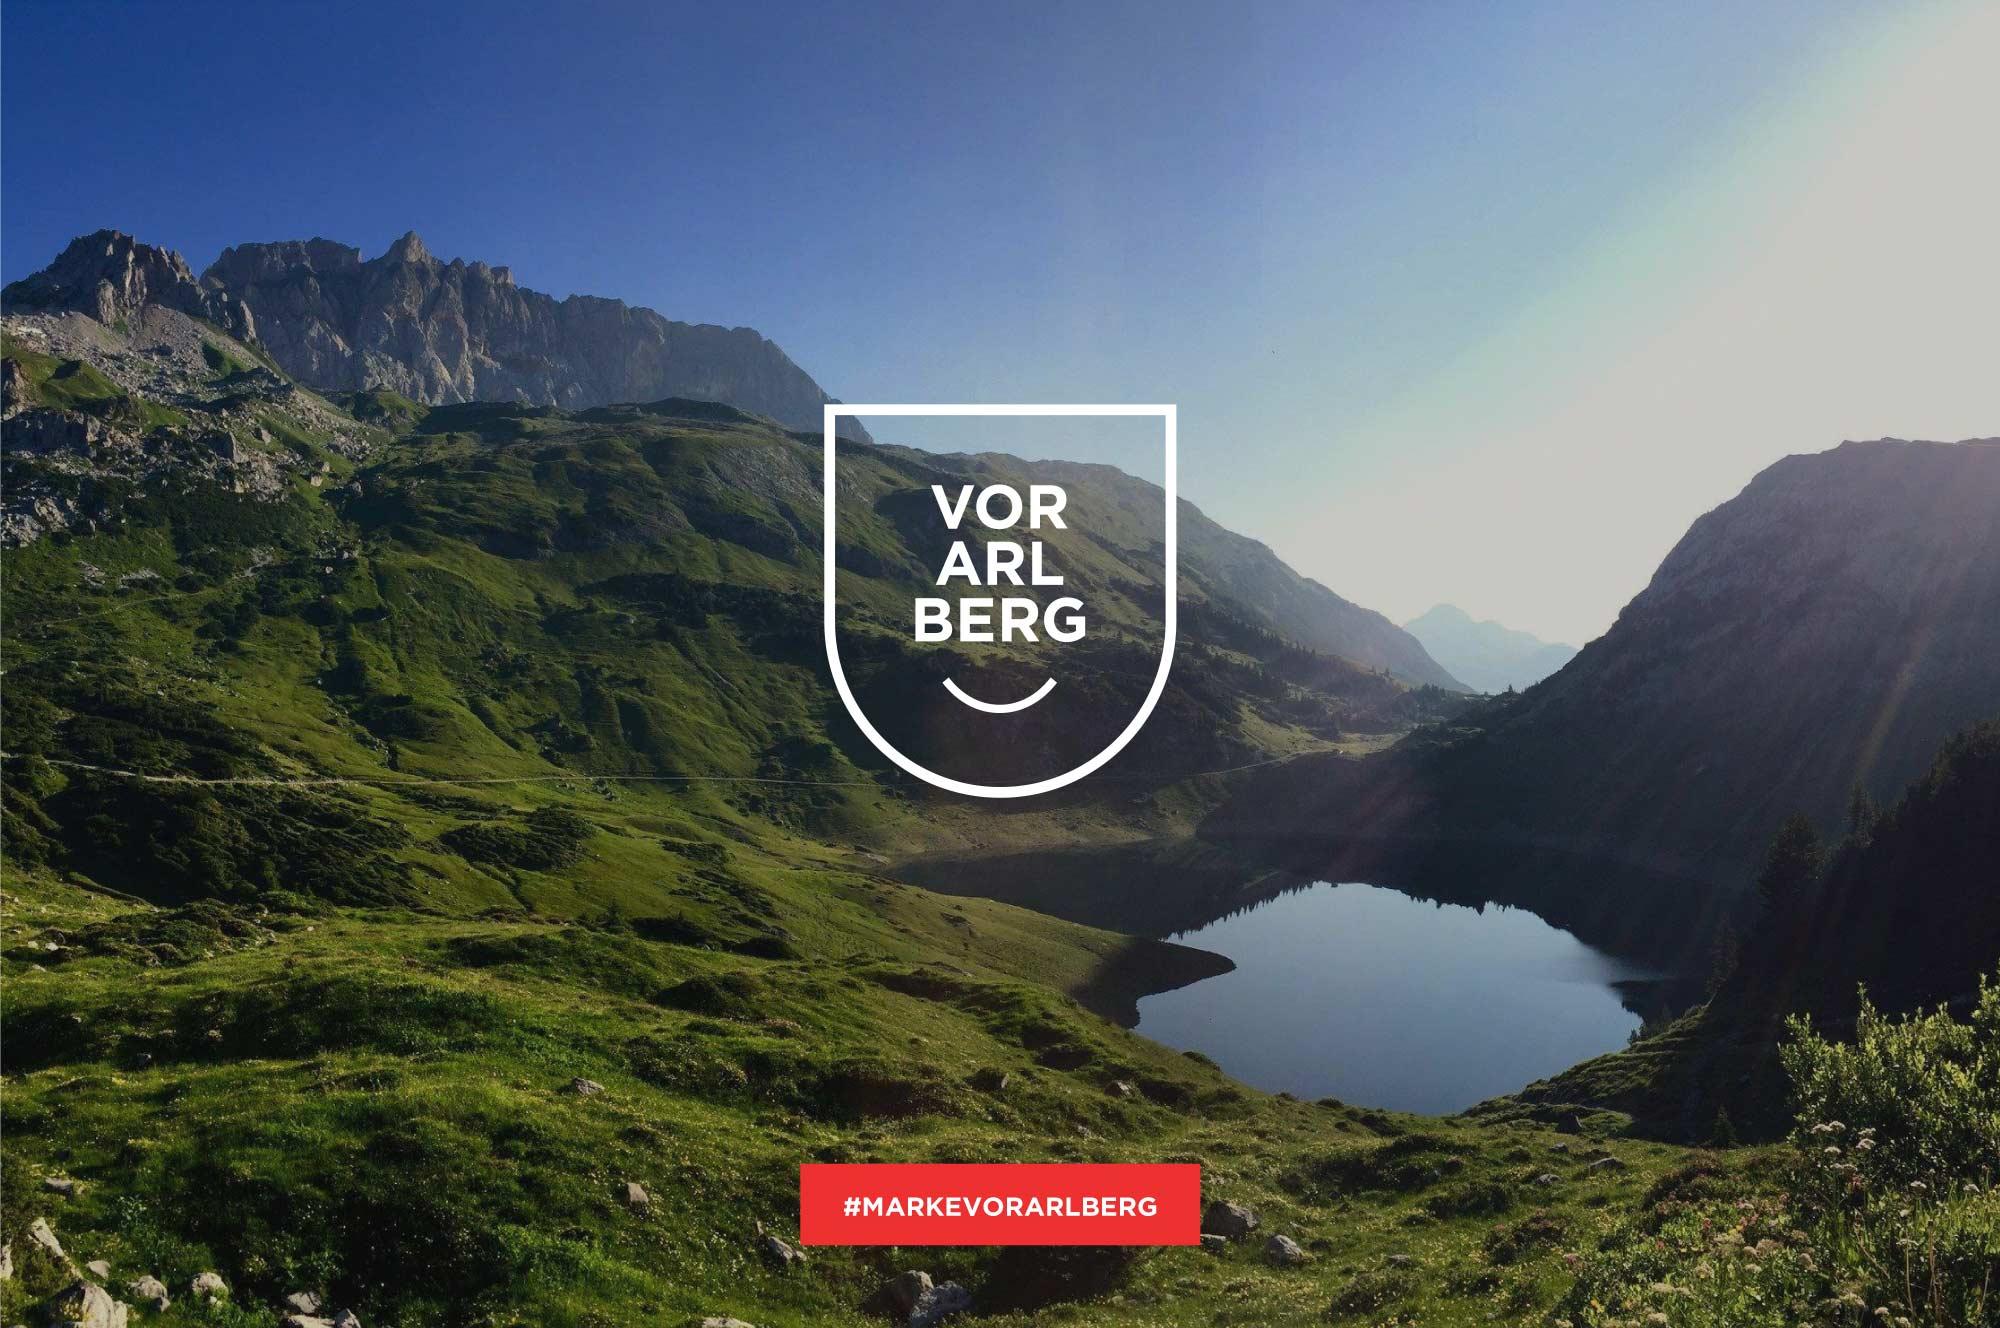 Marke Vorarlberg Logo auf Plakat